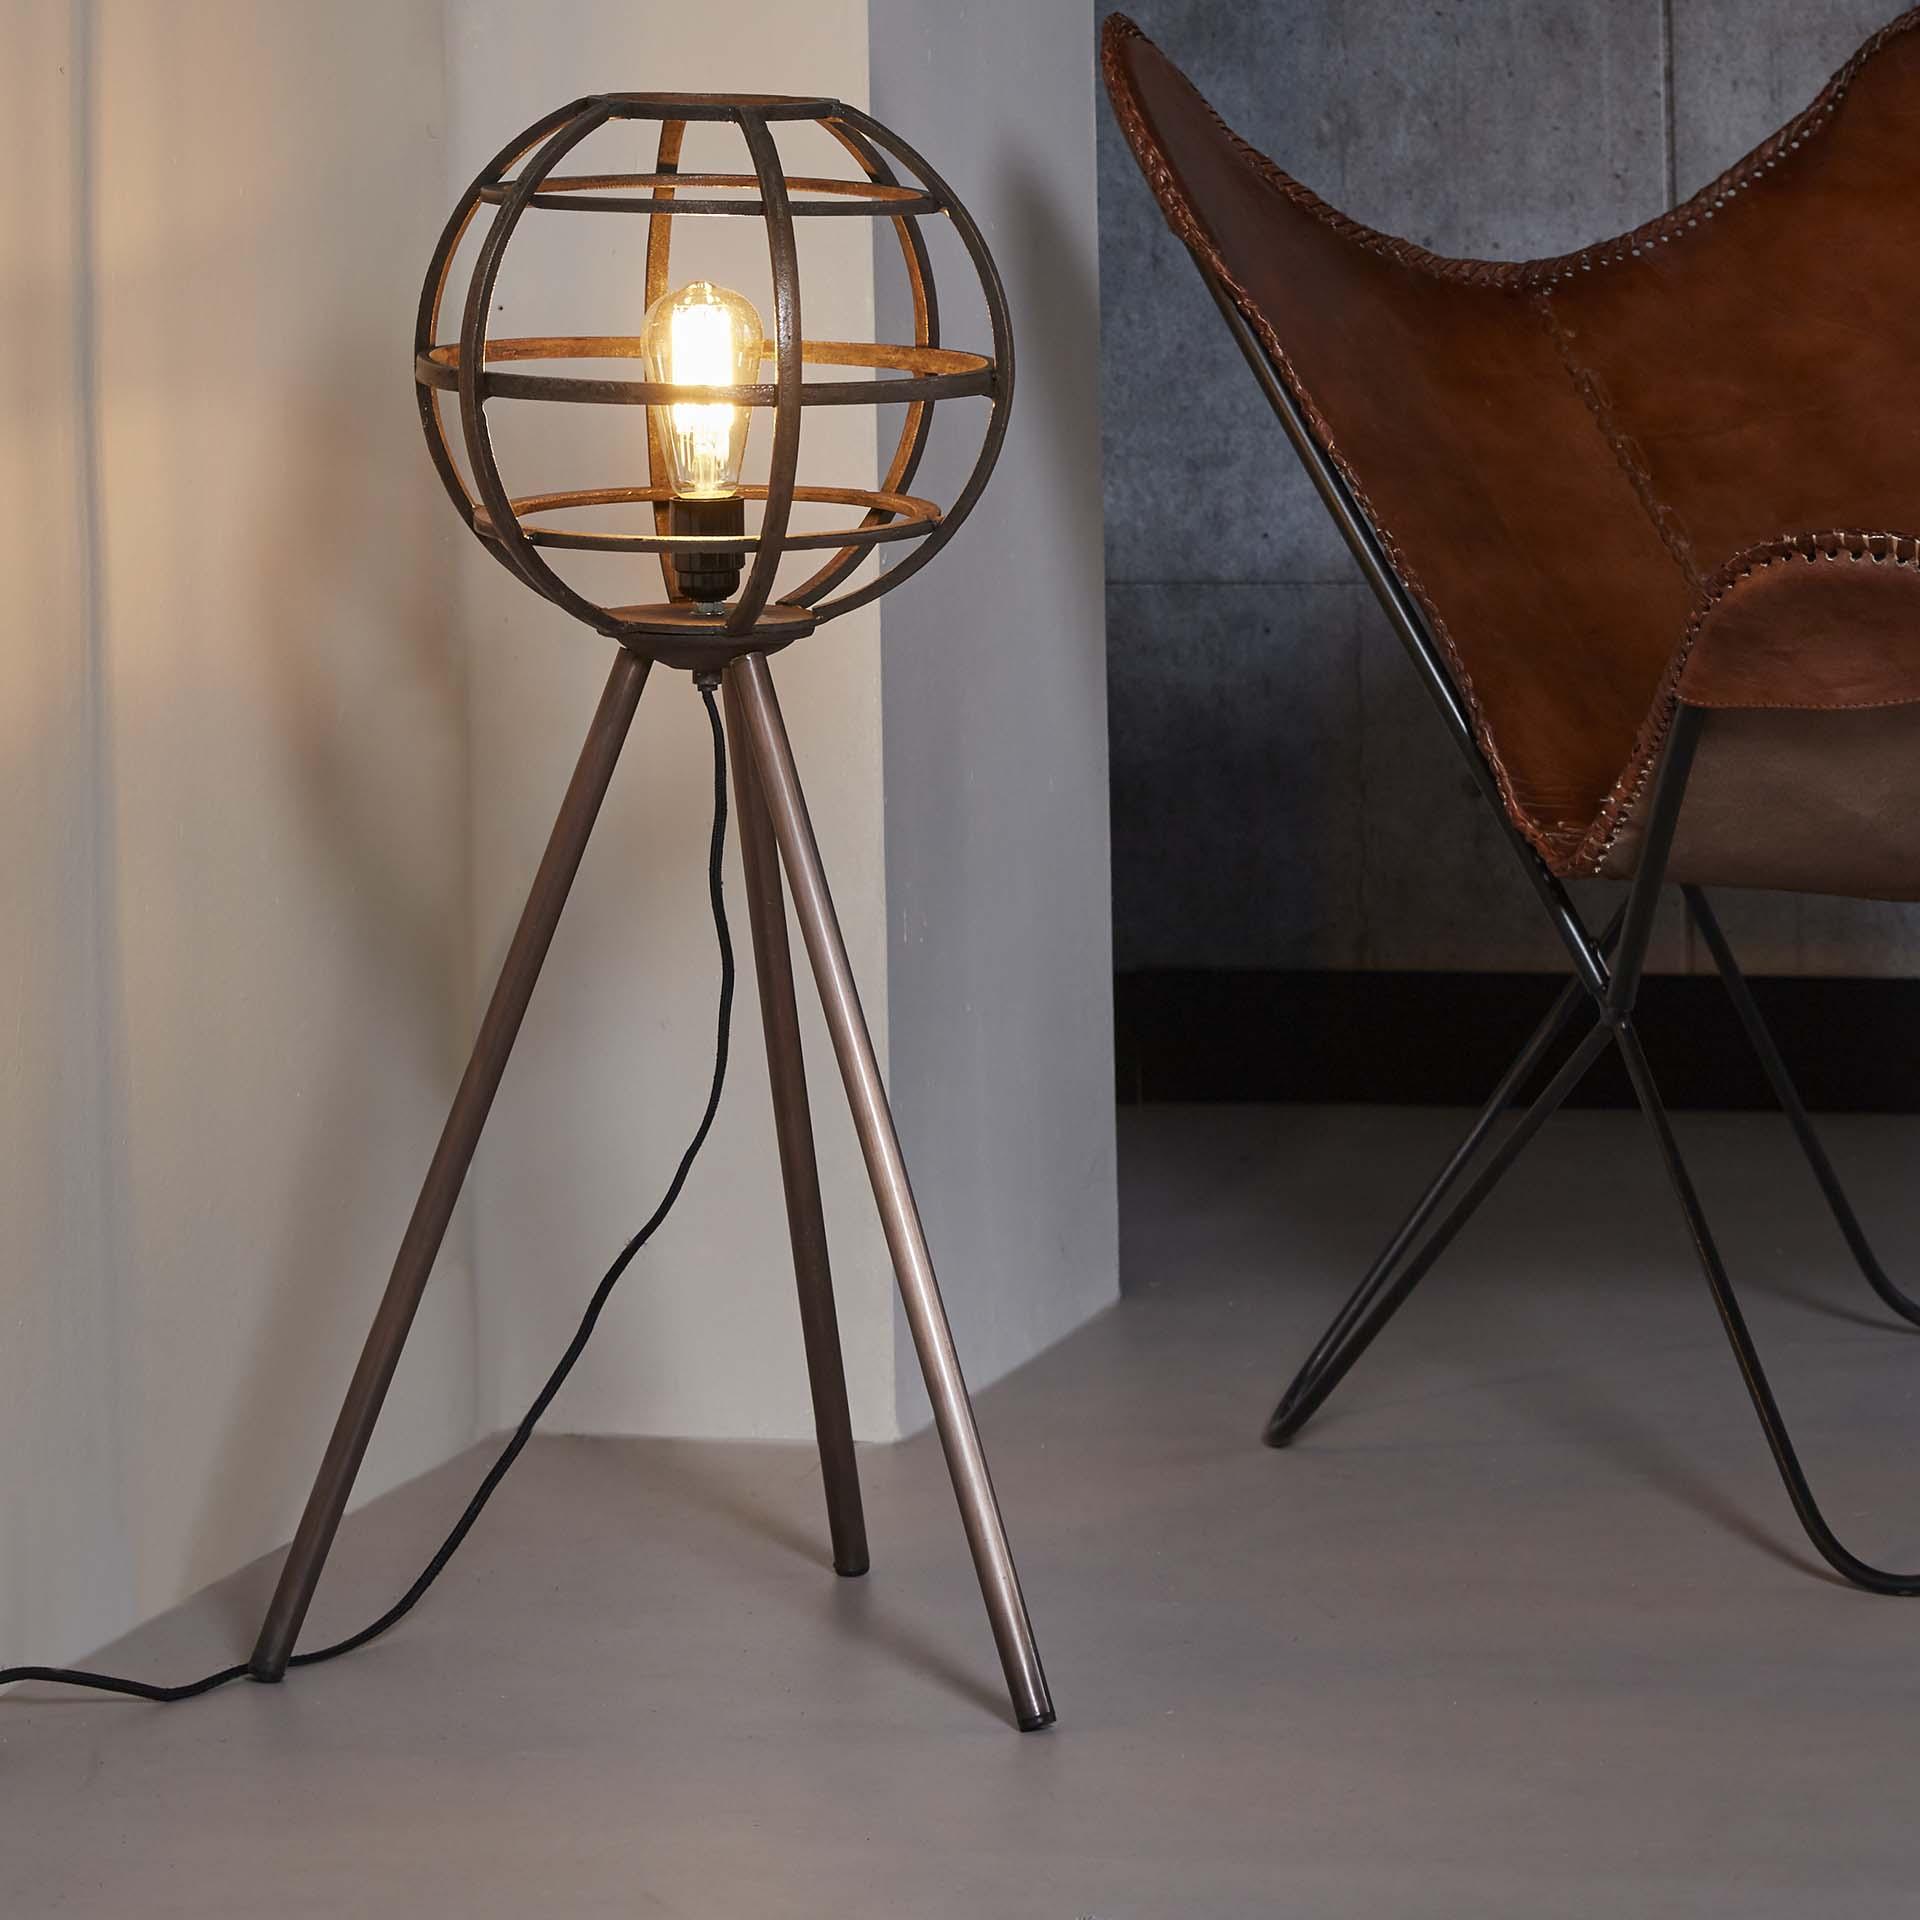 Vloerlamp Ø30 globe - Antiek koper finish